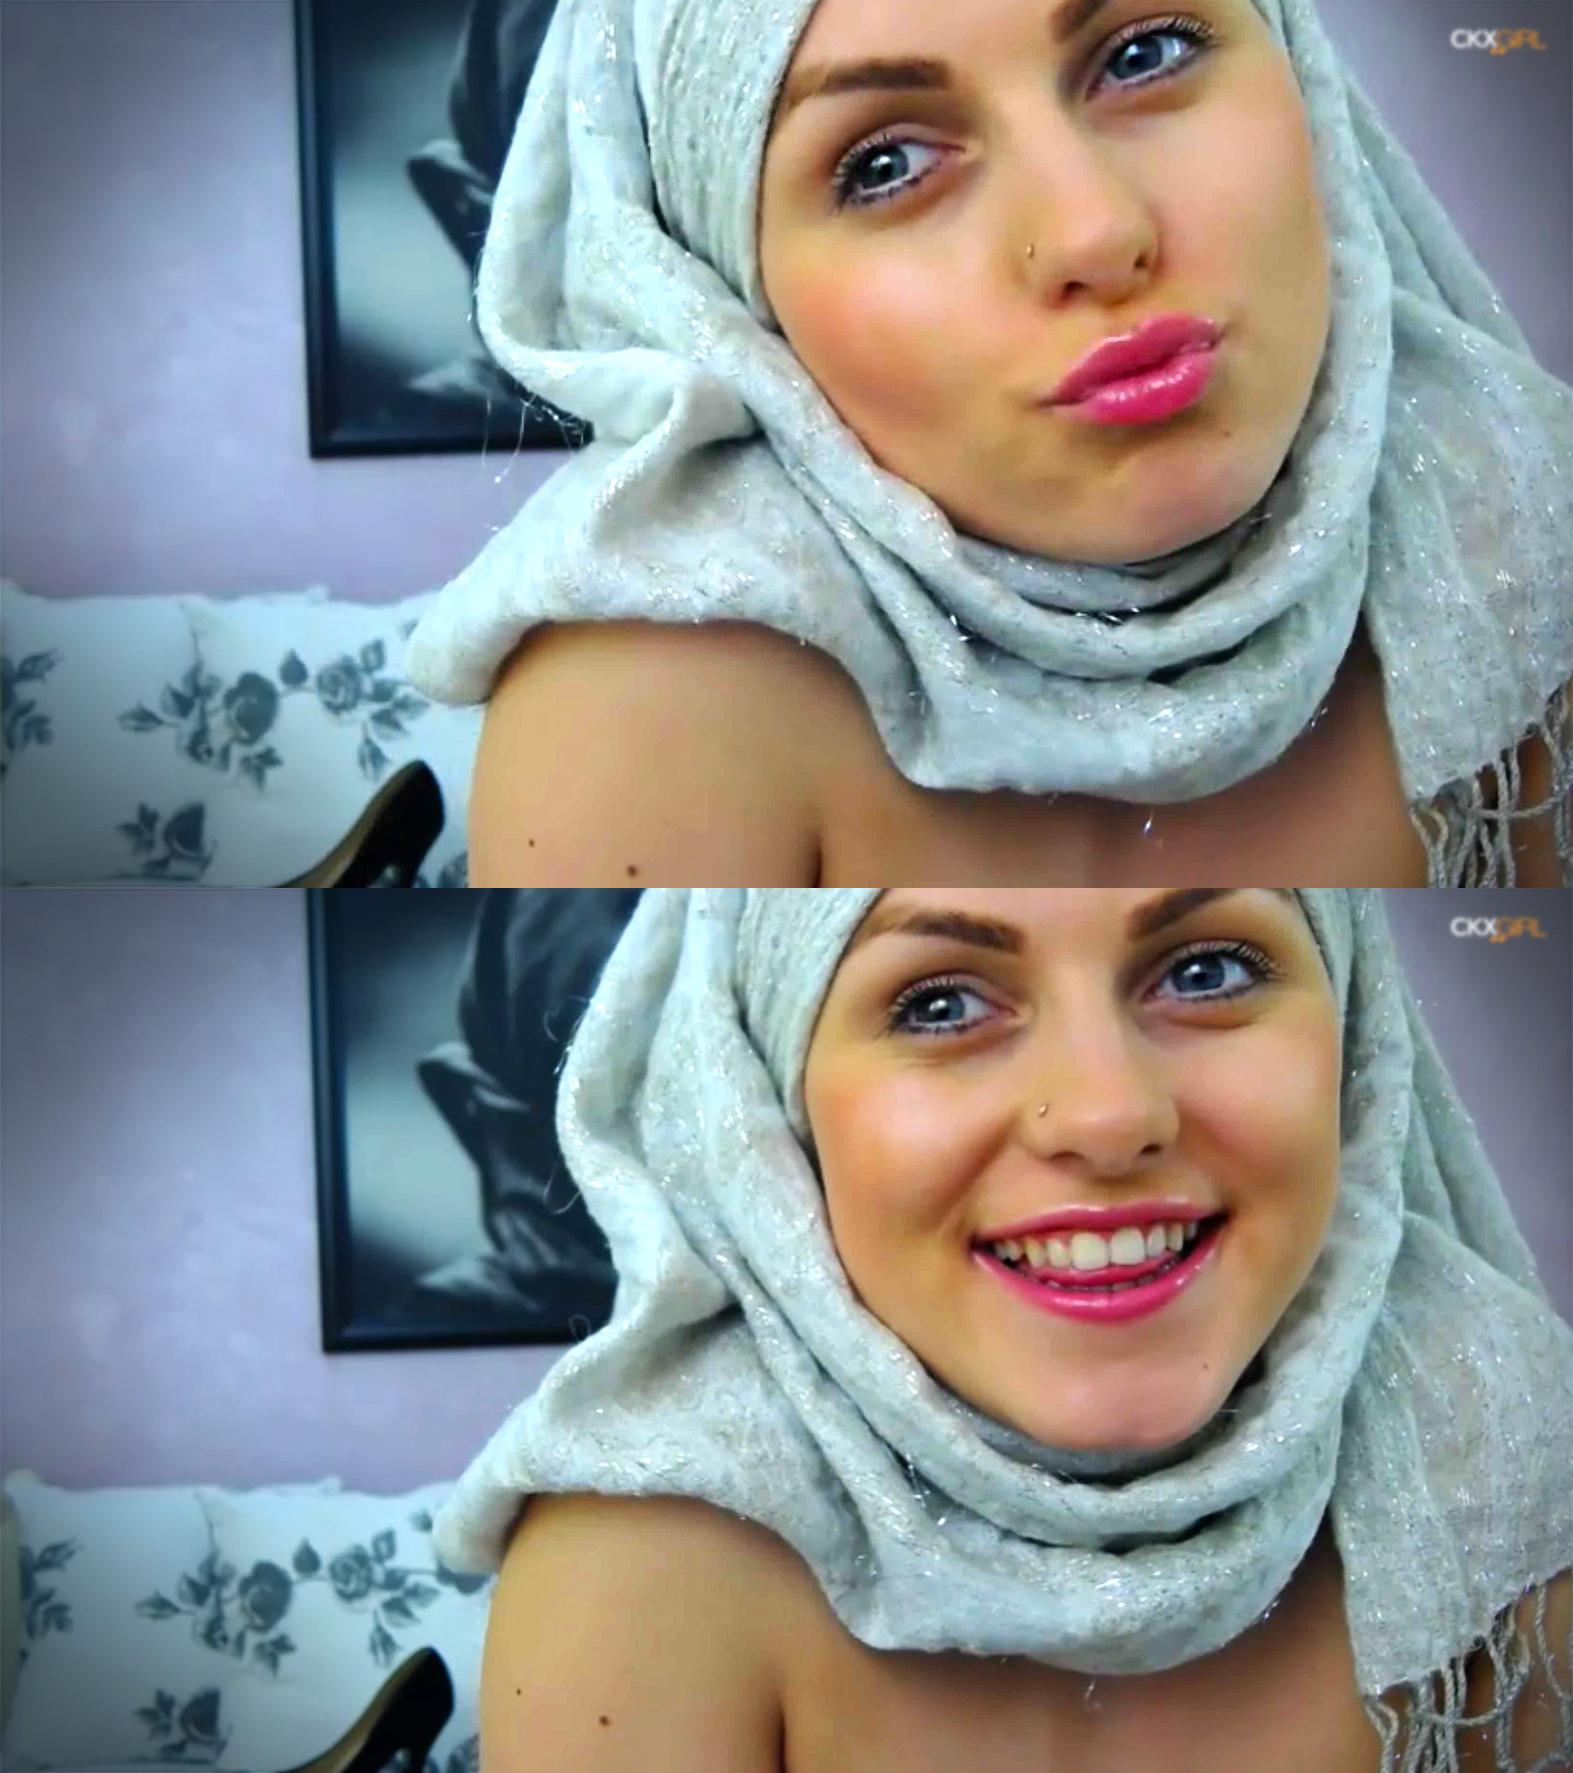 Muslimkyrah  Cokegirlx  Muslim Hijab Girls  Live Sex Shows  Xxx  Cokegirlxcom-3141